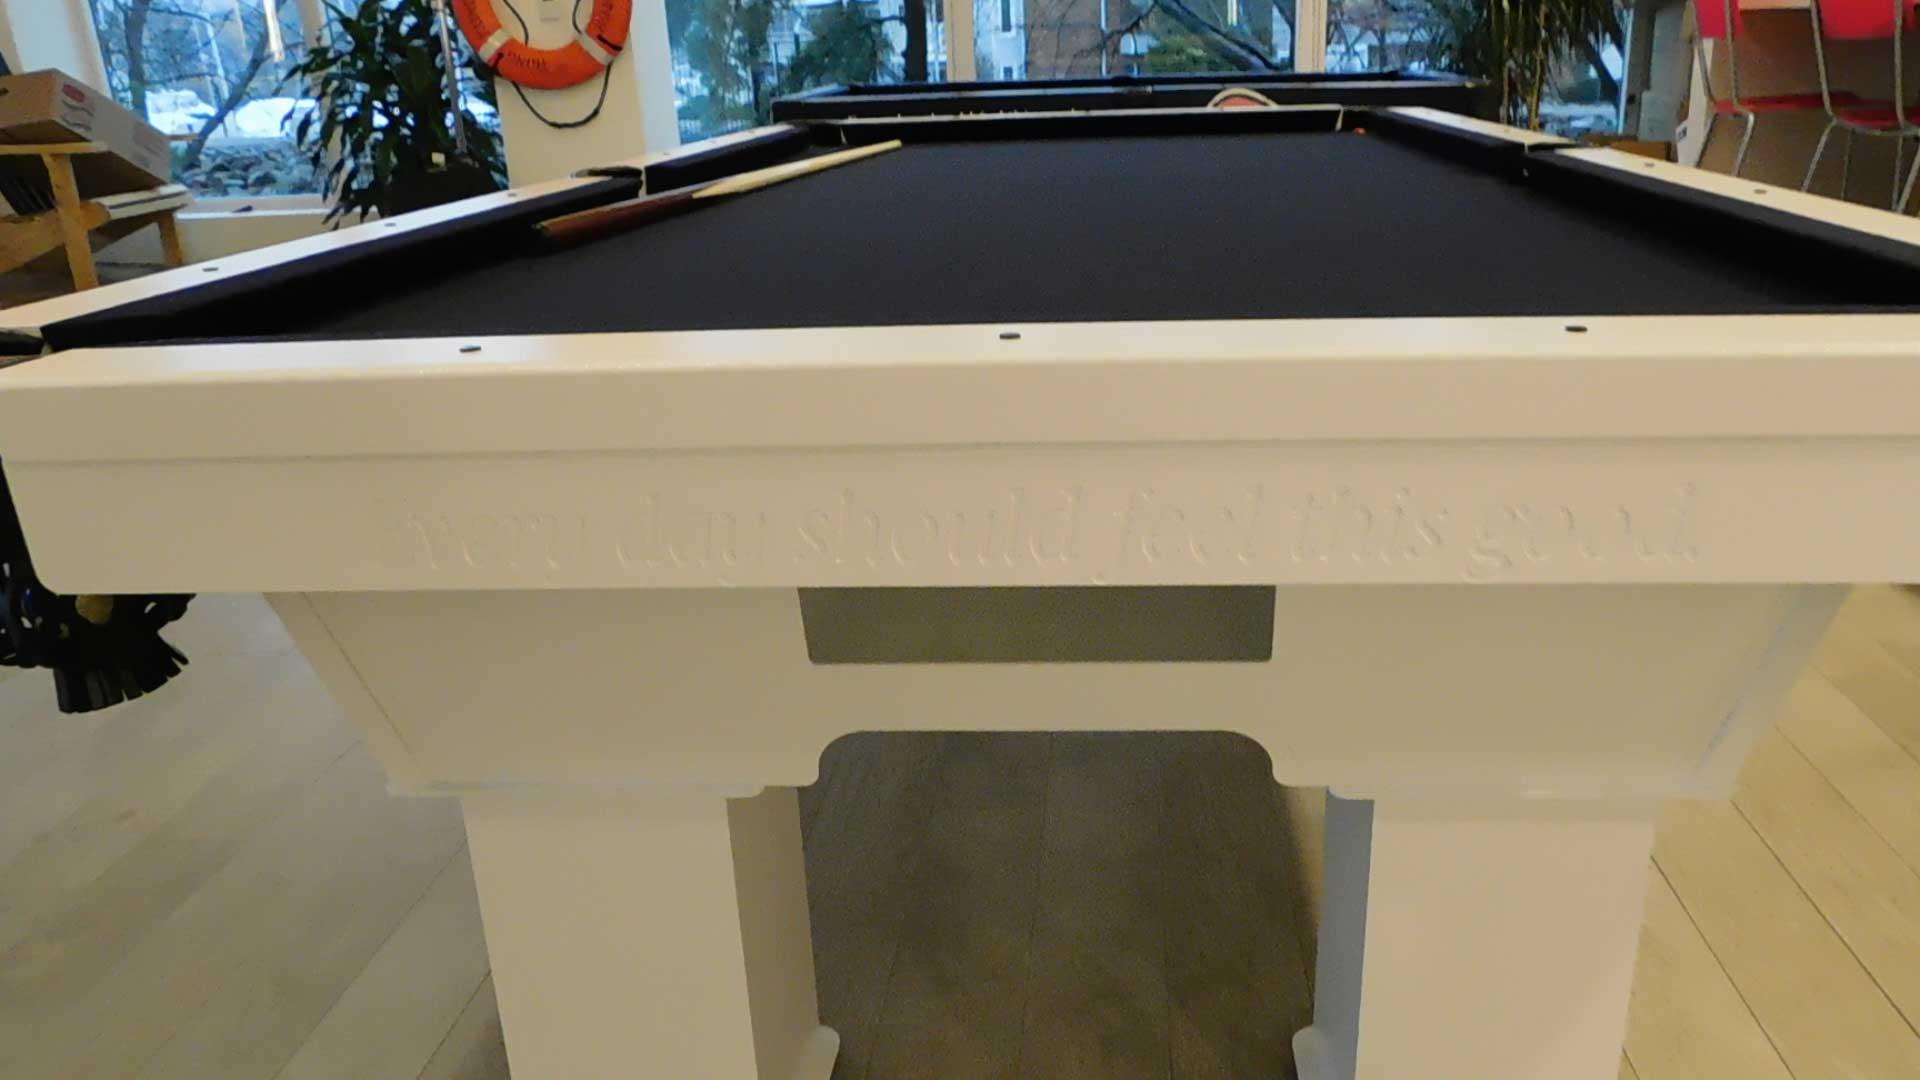 Vineyard Vine's custom outdoor pool table with engraved company slogan